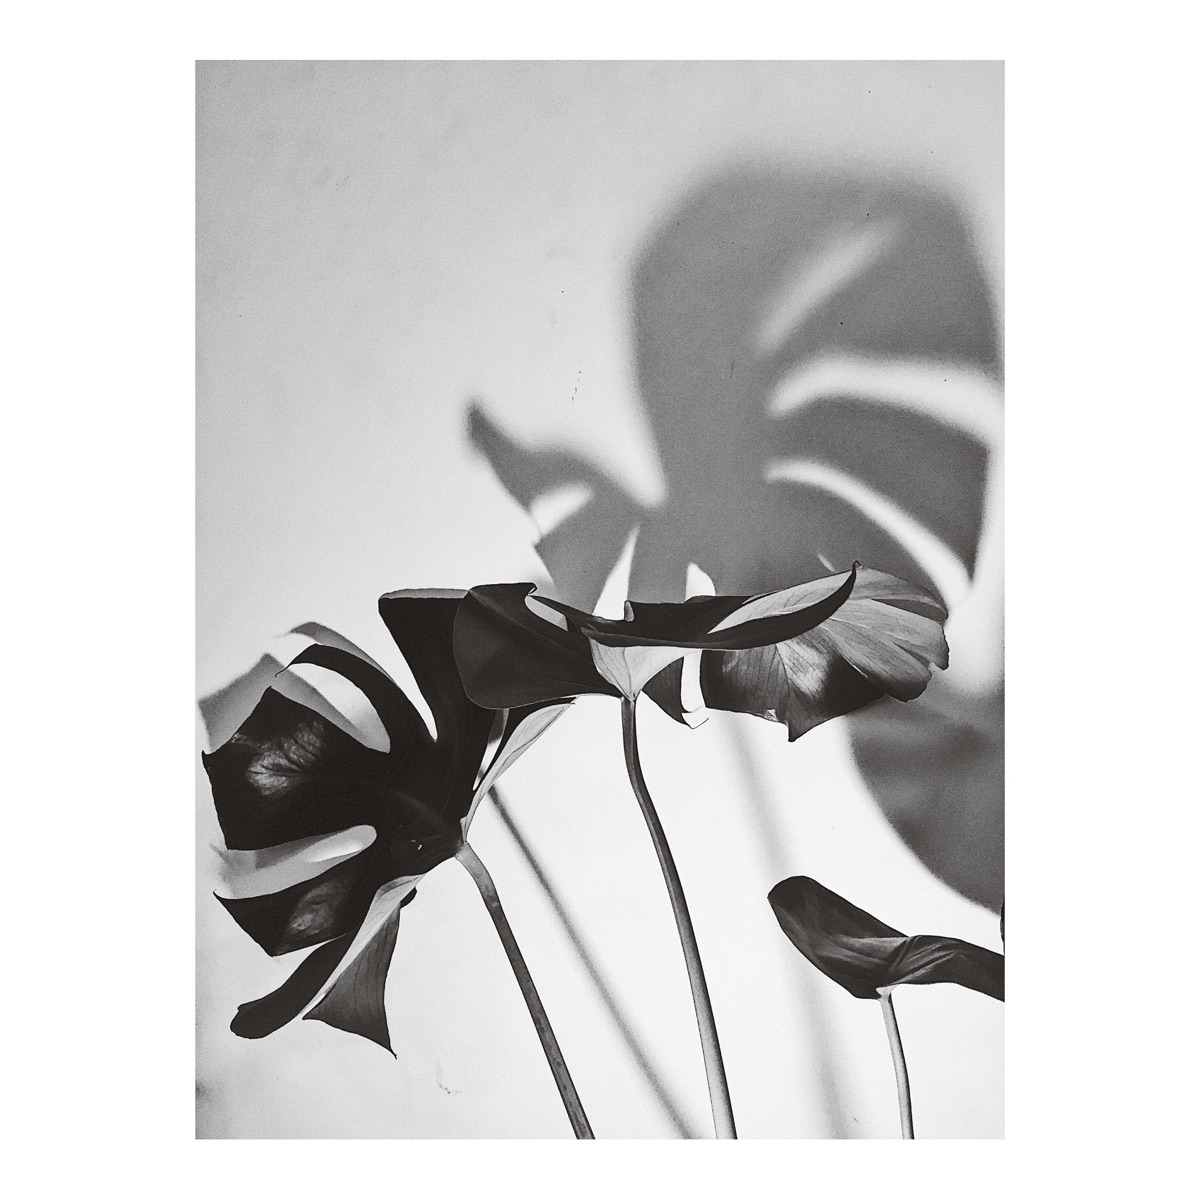 Today bw minimal photography pl - filmarra   ello